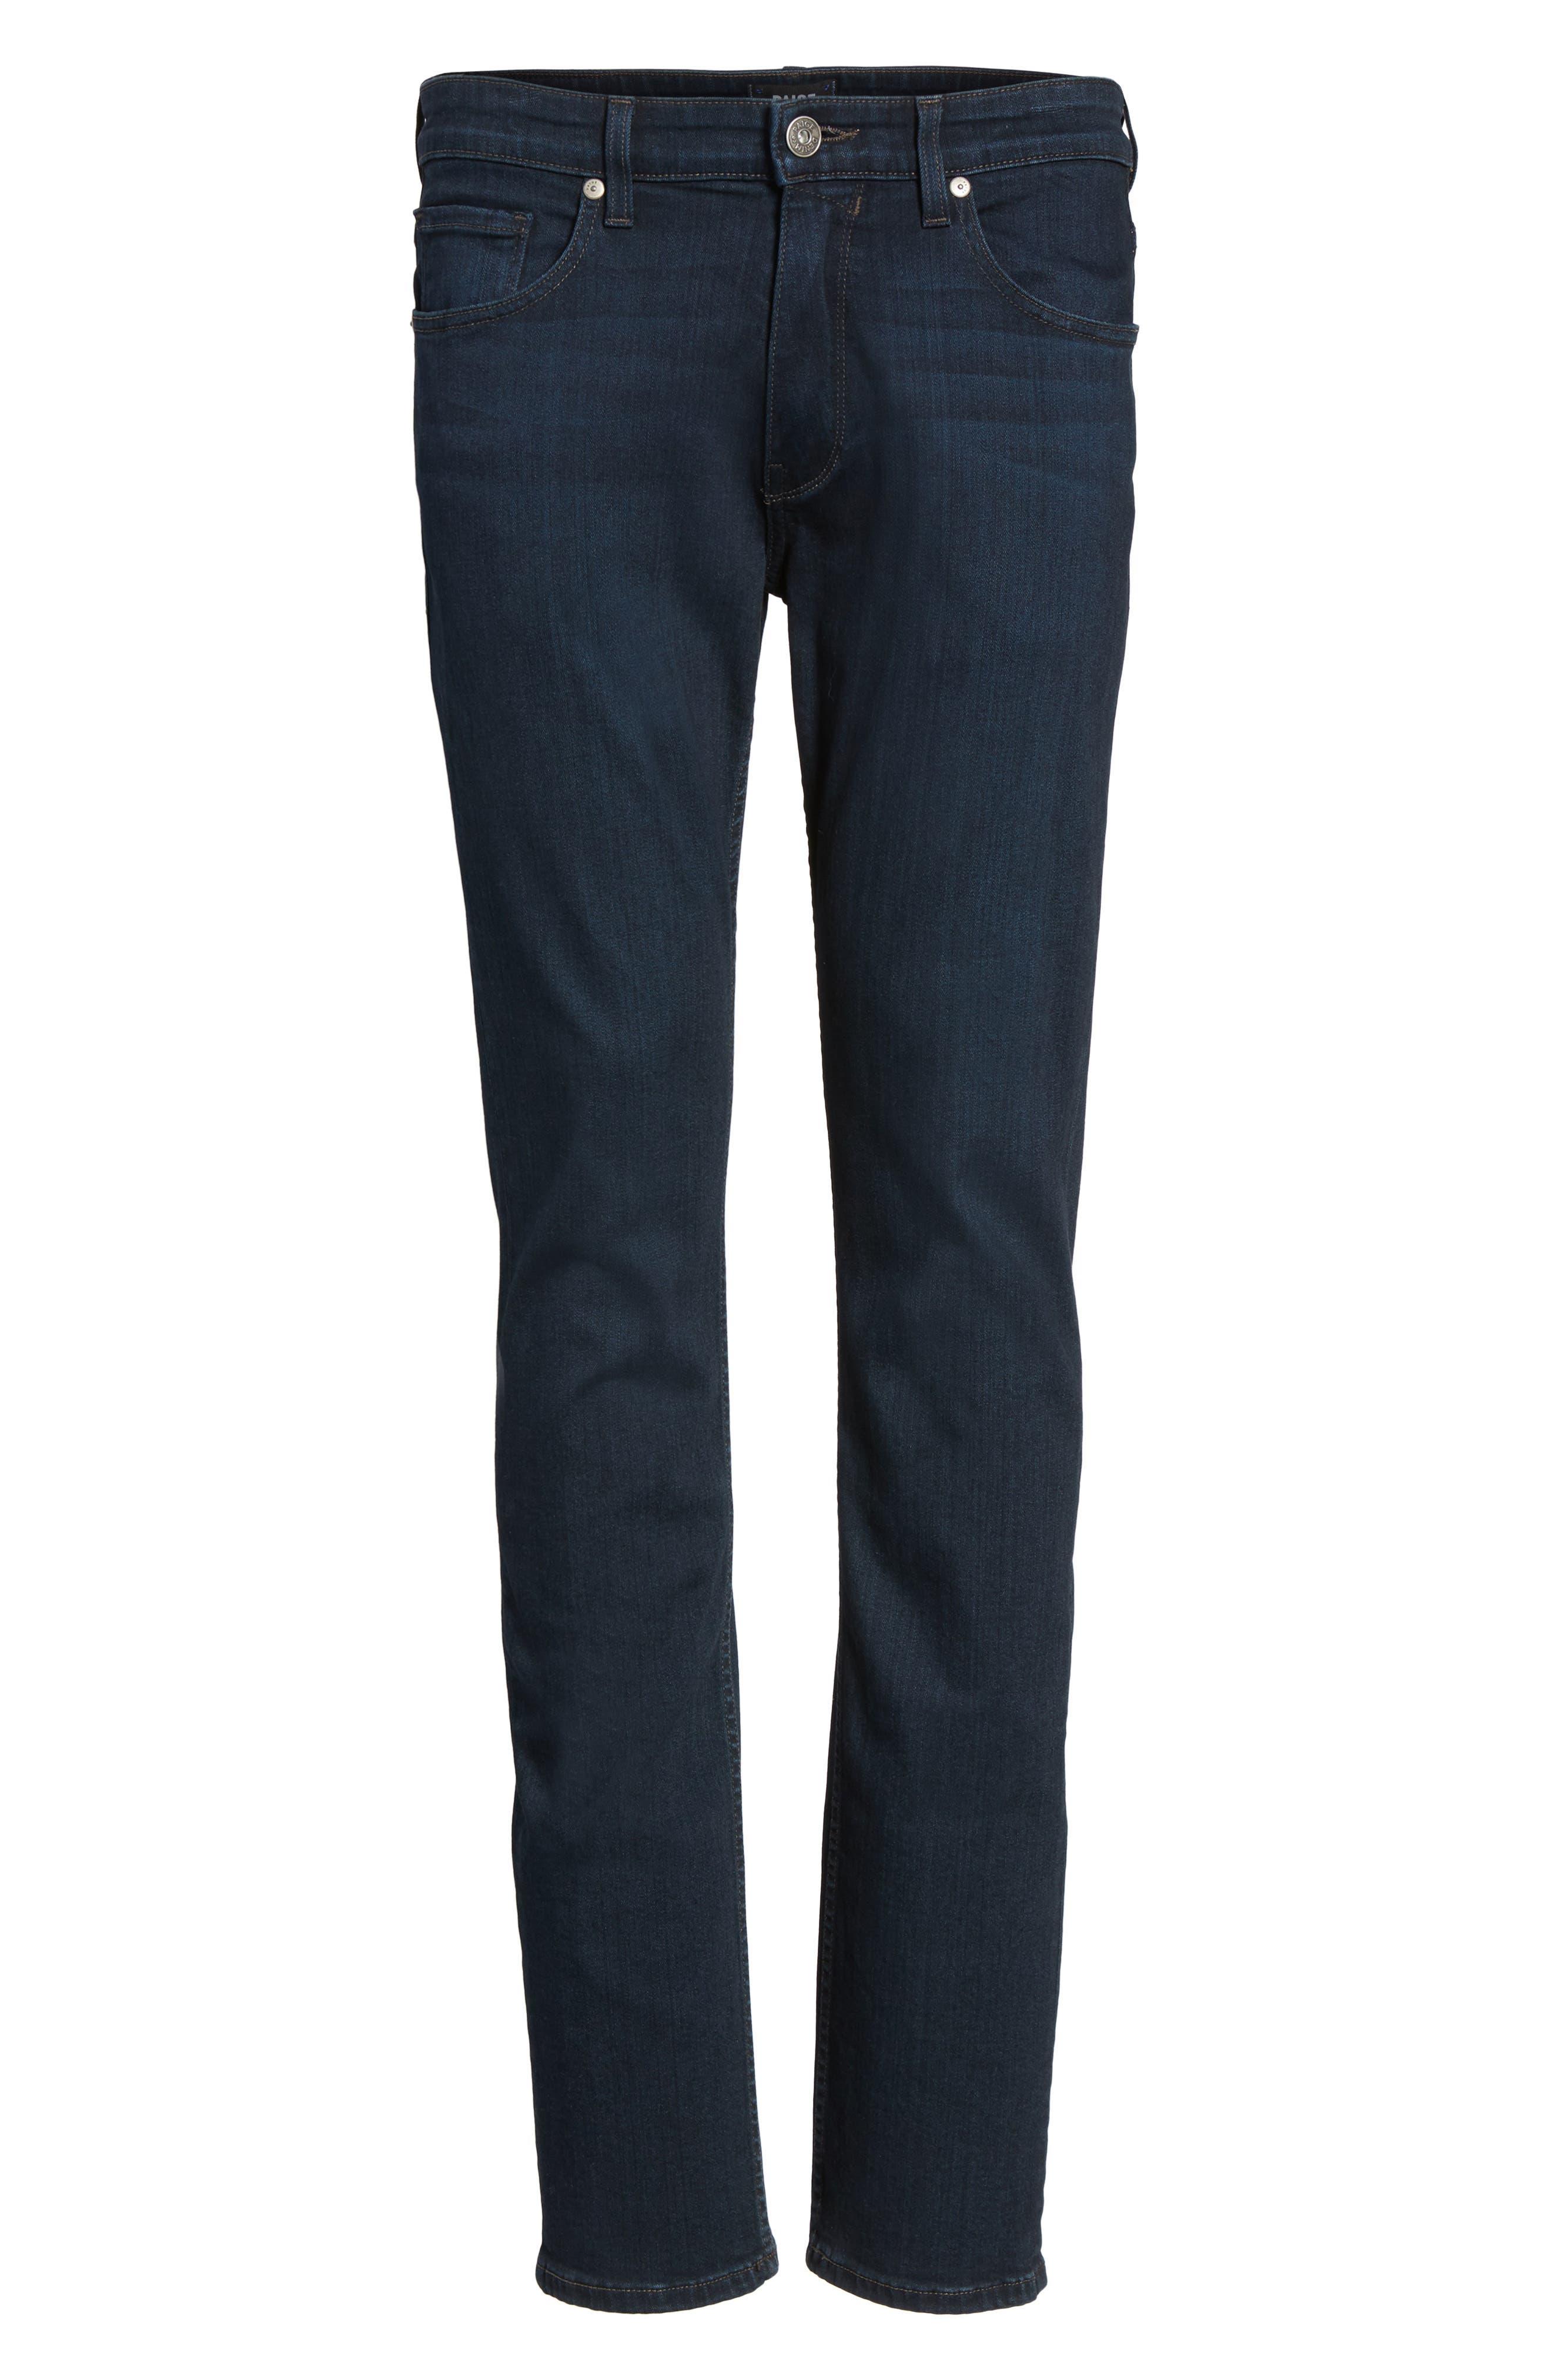 PAIGE,                             Normandie Straight Leg Jeans,                             Alternate thumbnail 6, color,                             ARLO